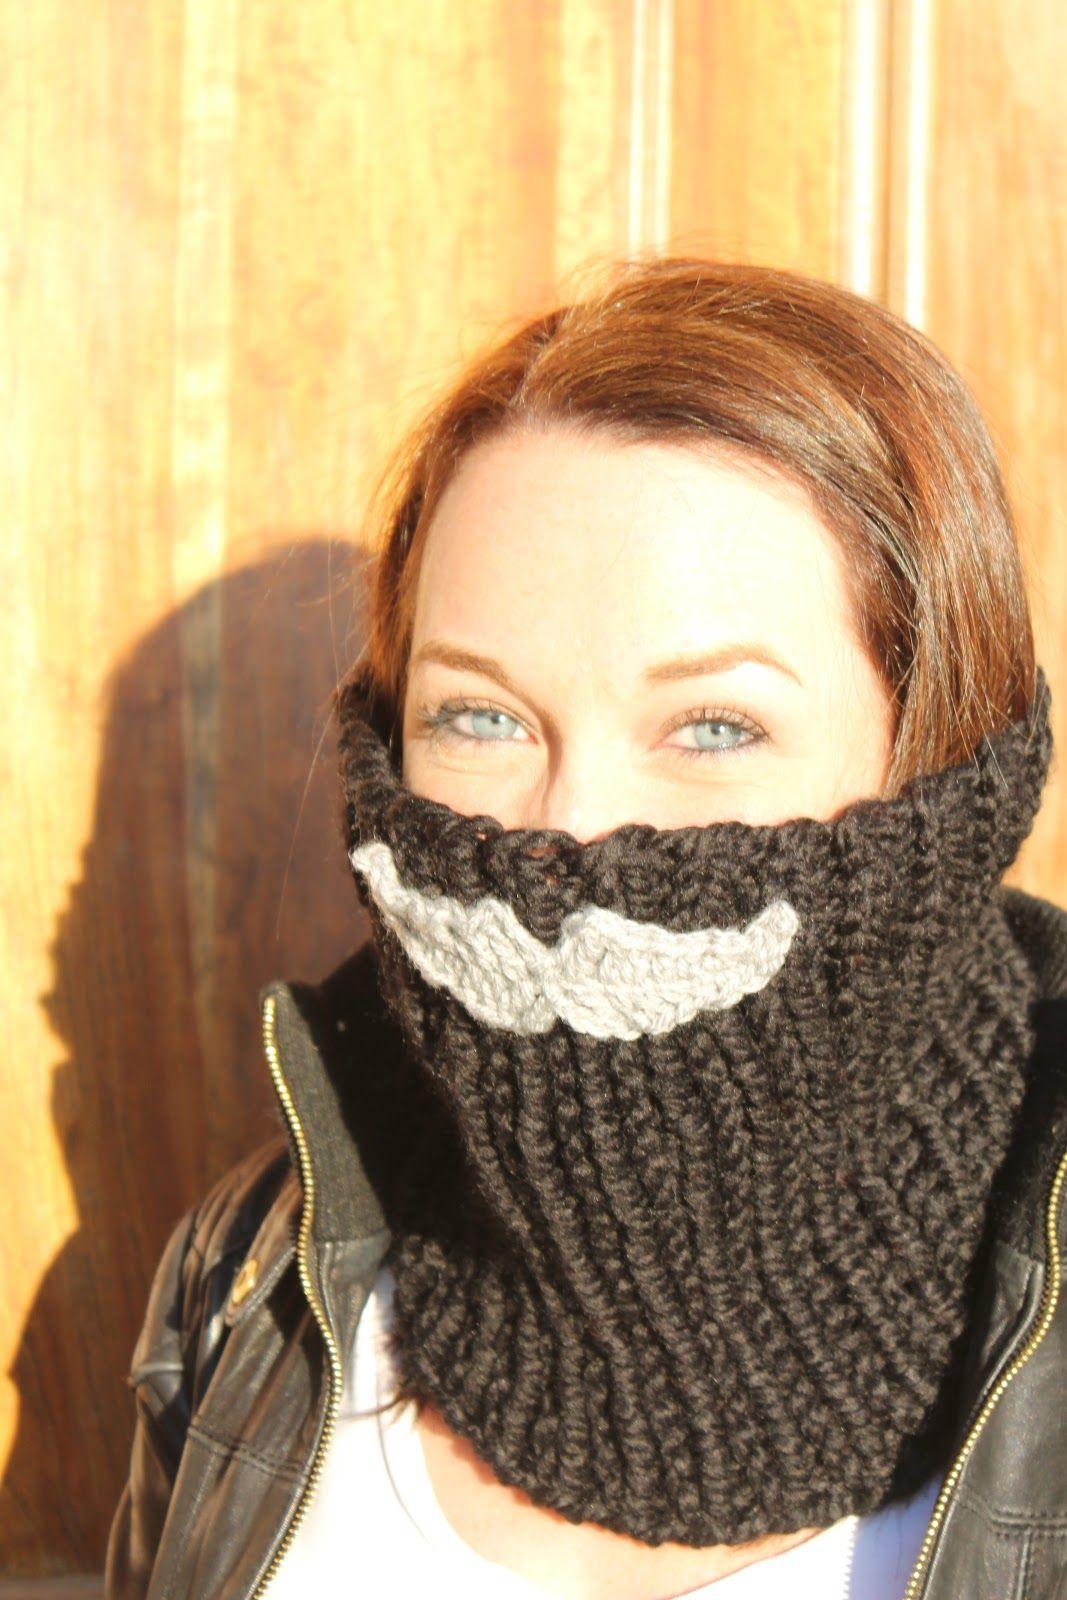 Mustache neck warmer free patterns from crocheters pinterest mustache neck warmer crochet mustache patterncrochet bankloansurffo Images